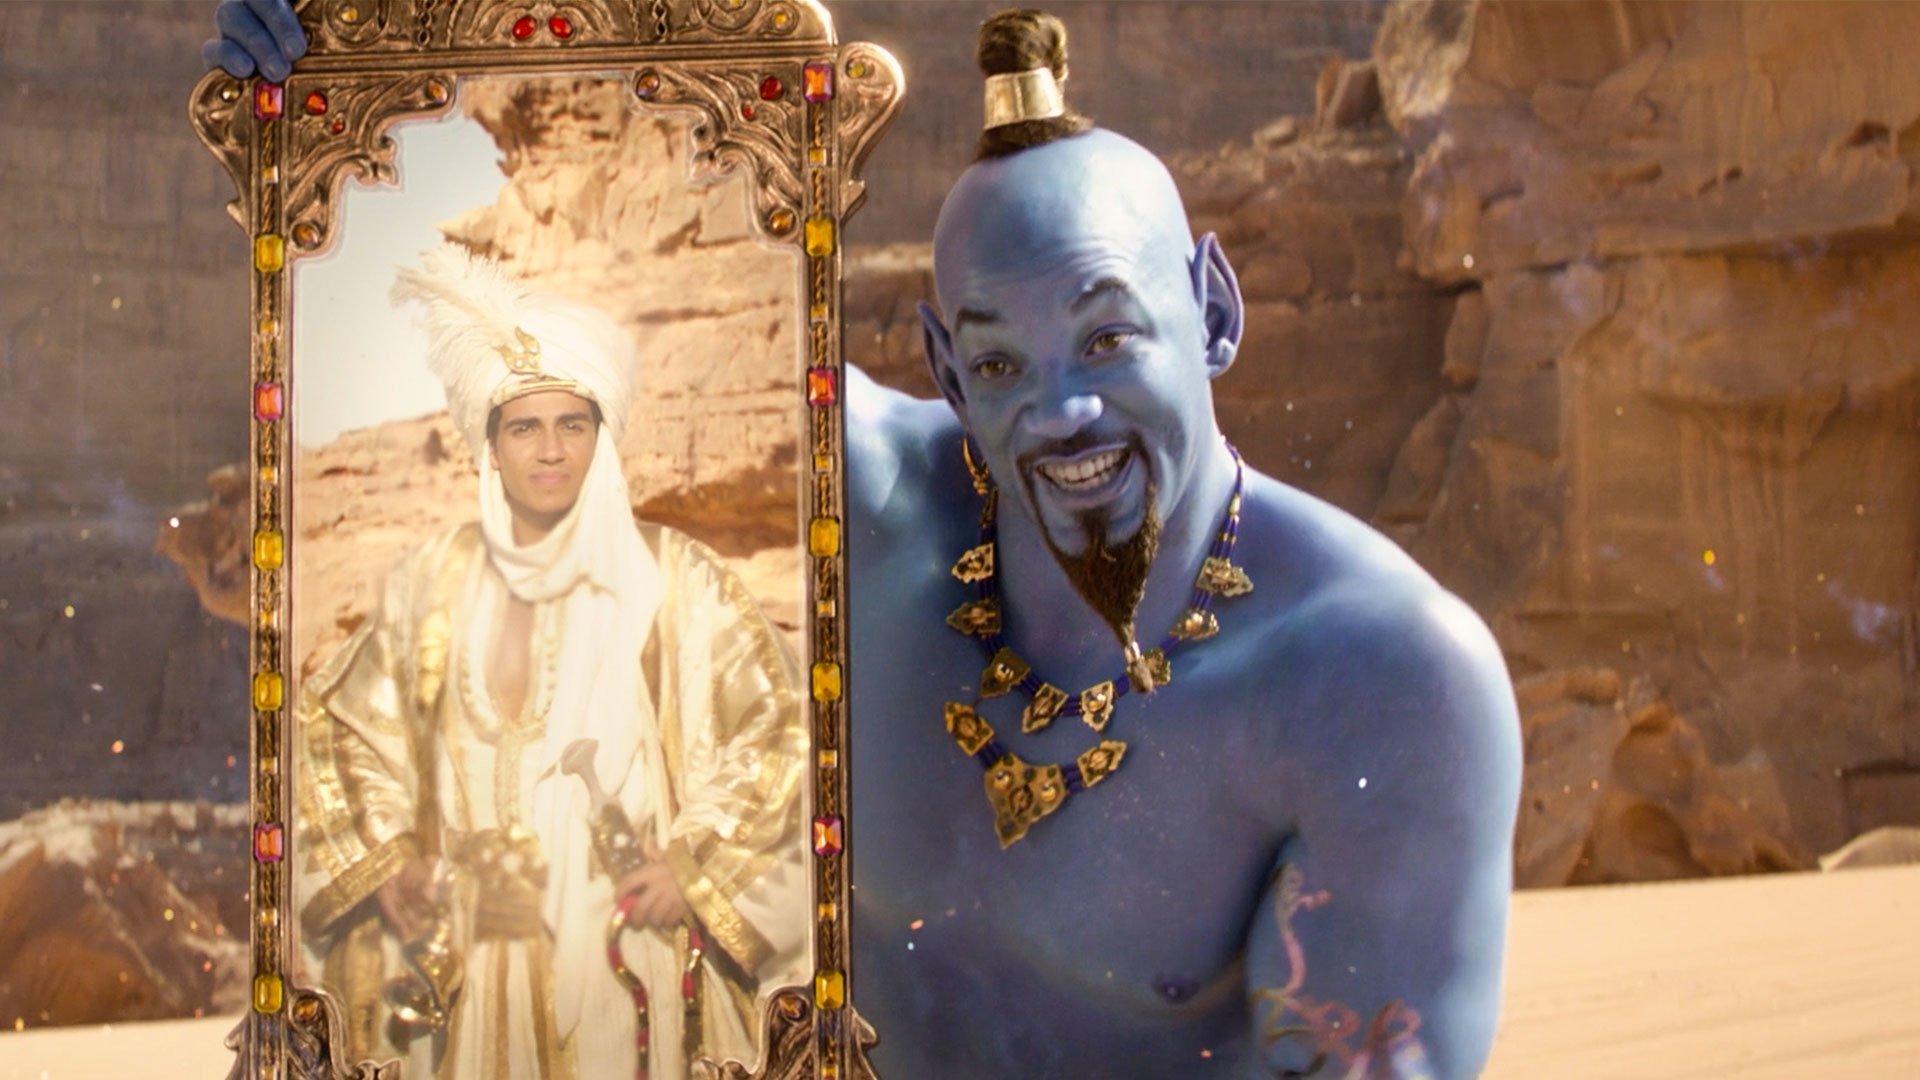 Aladdin Espelho